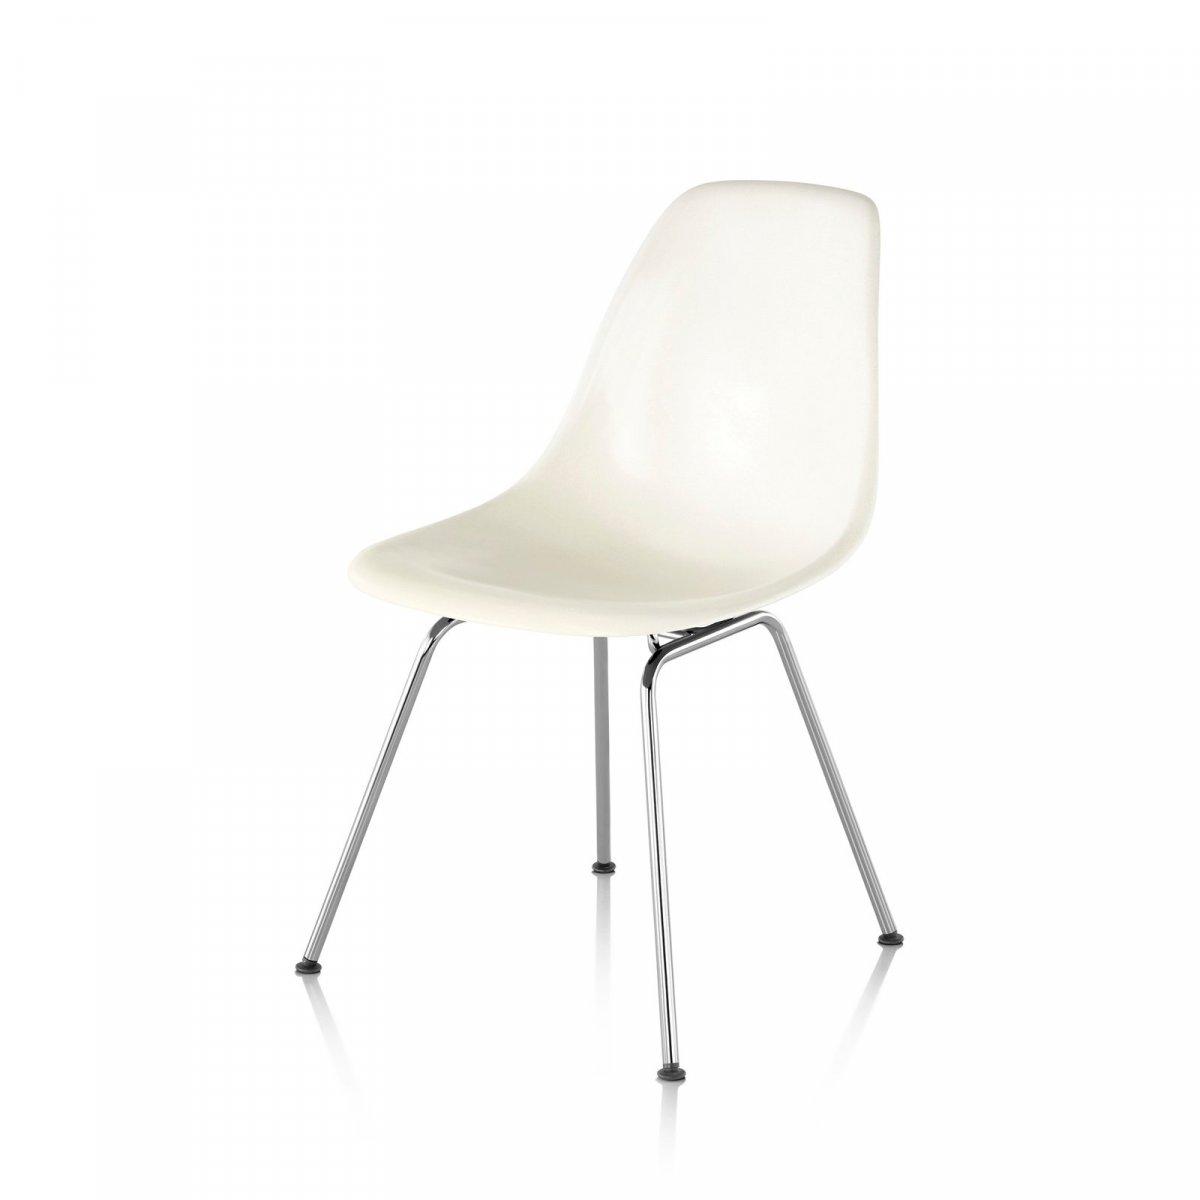 Eames Molded Plastic Side Chair 4-Leg Base, white.